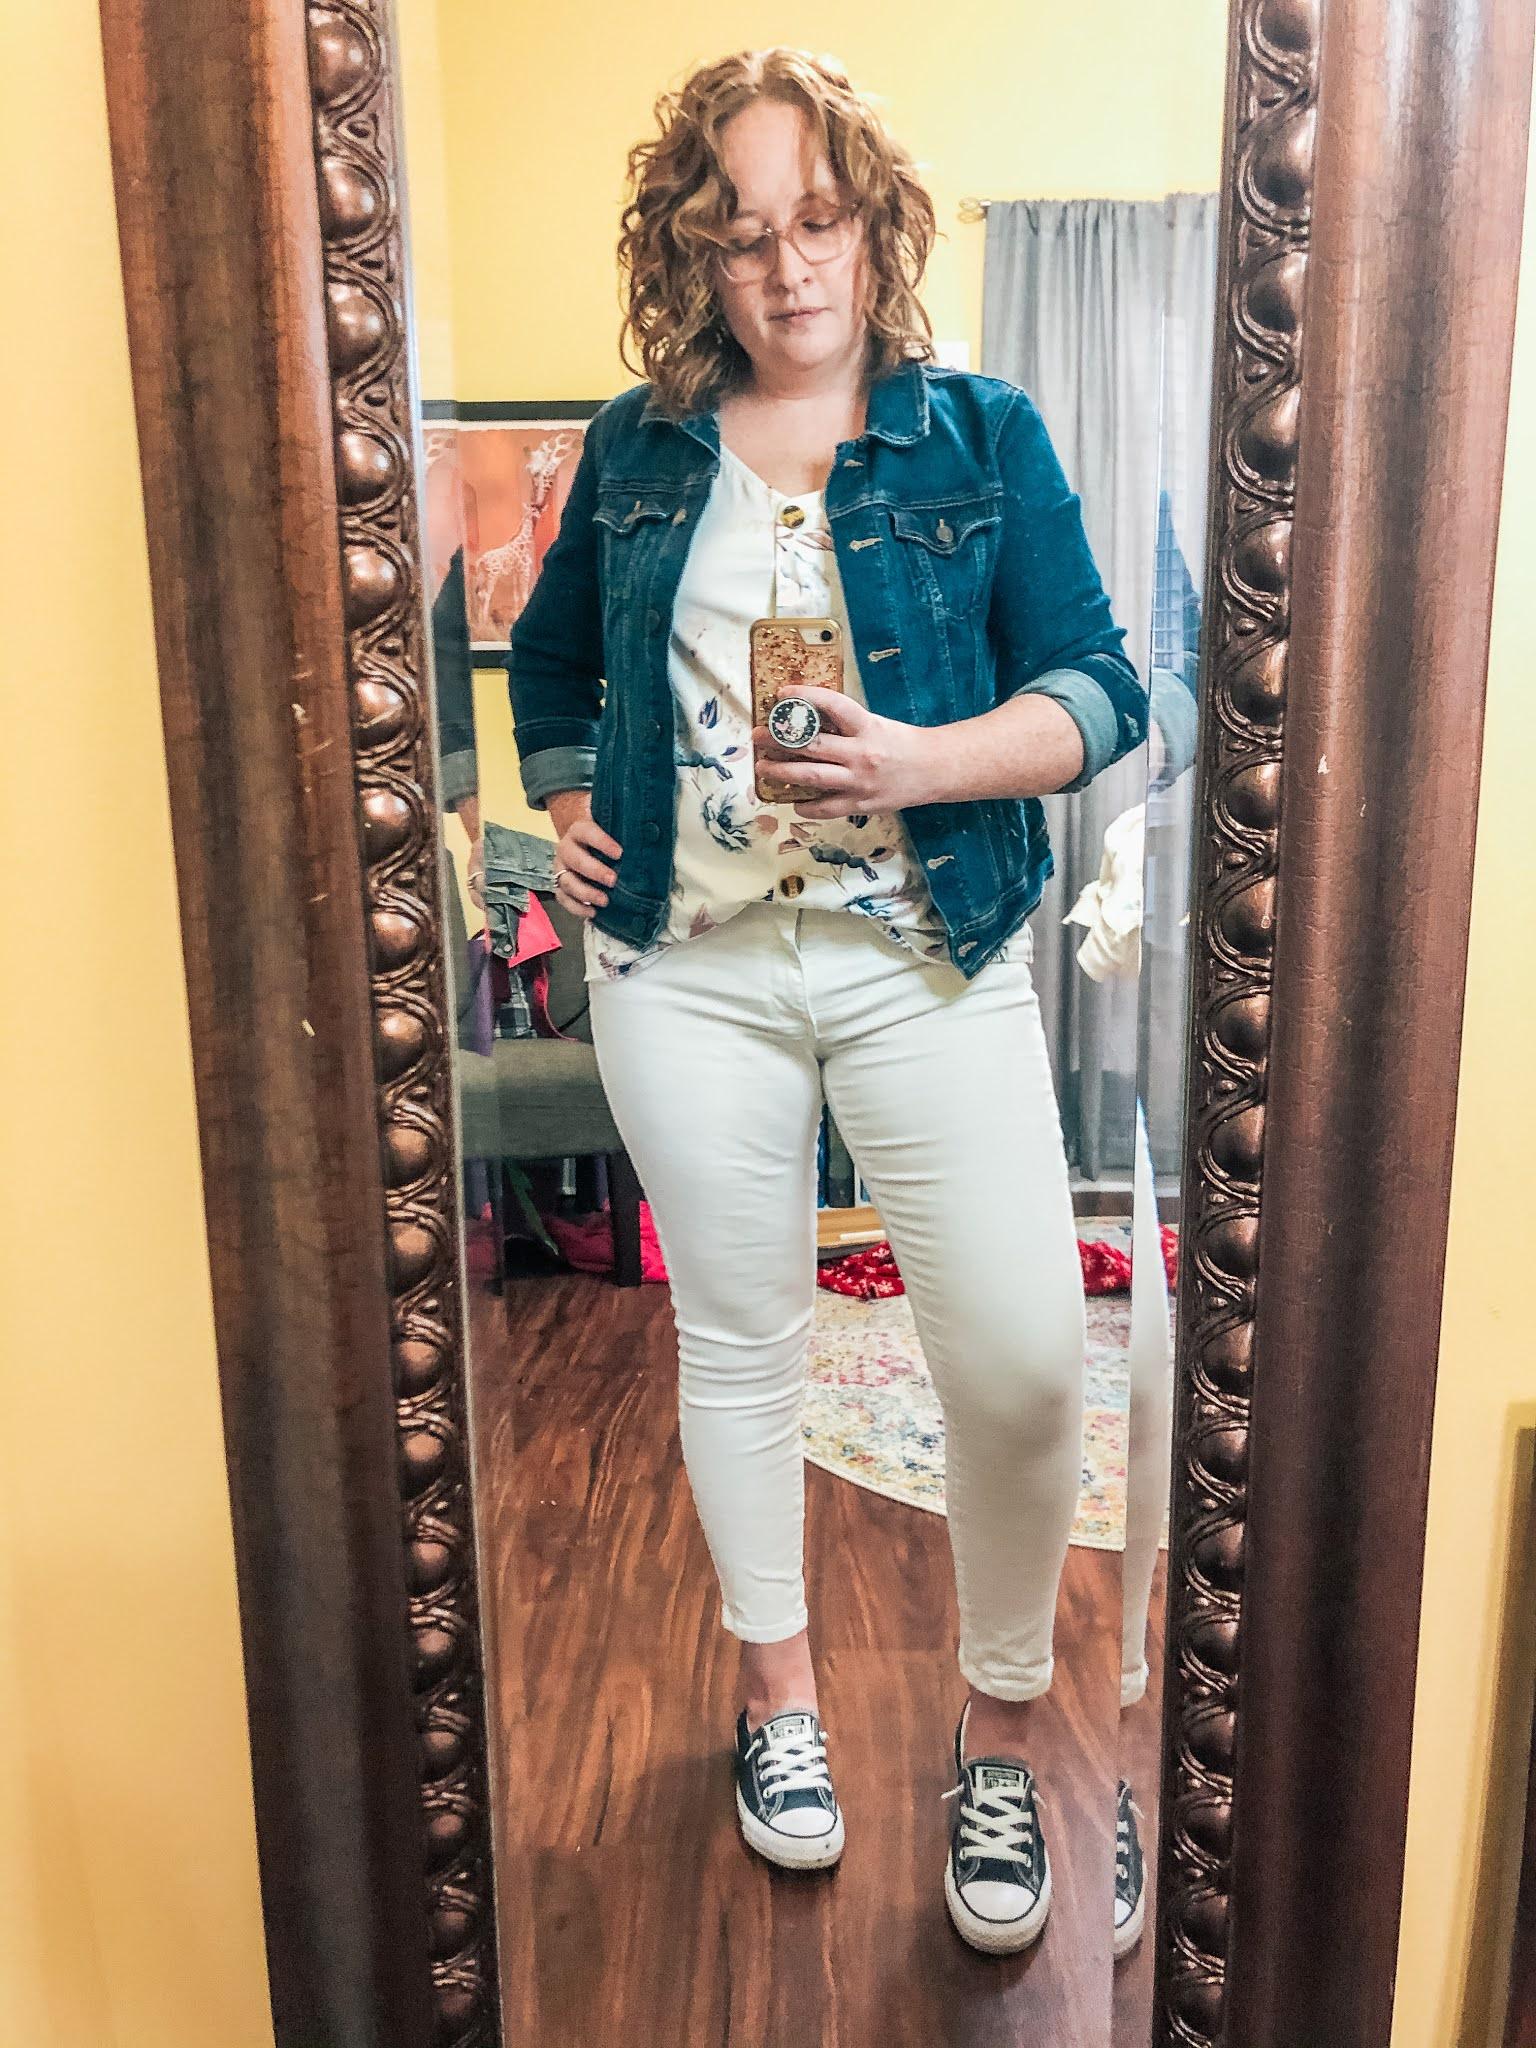 white-jeans-floral-cami-denim-jacket-converse